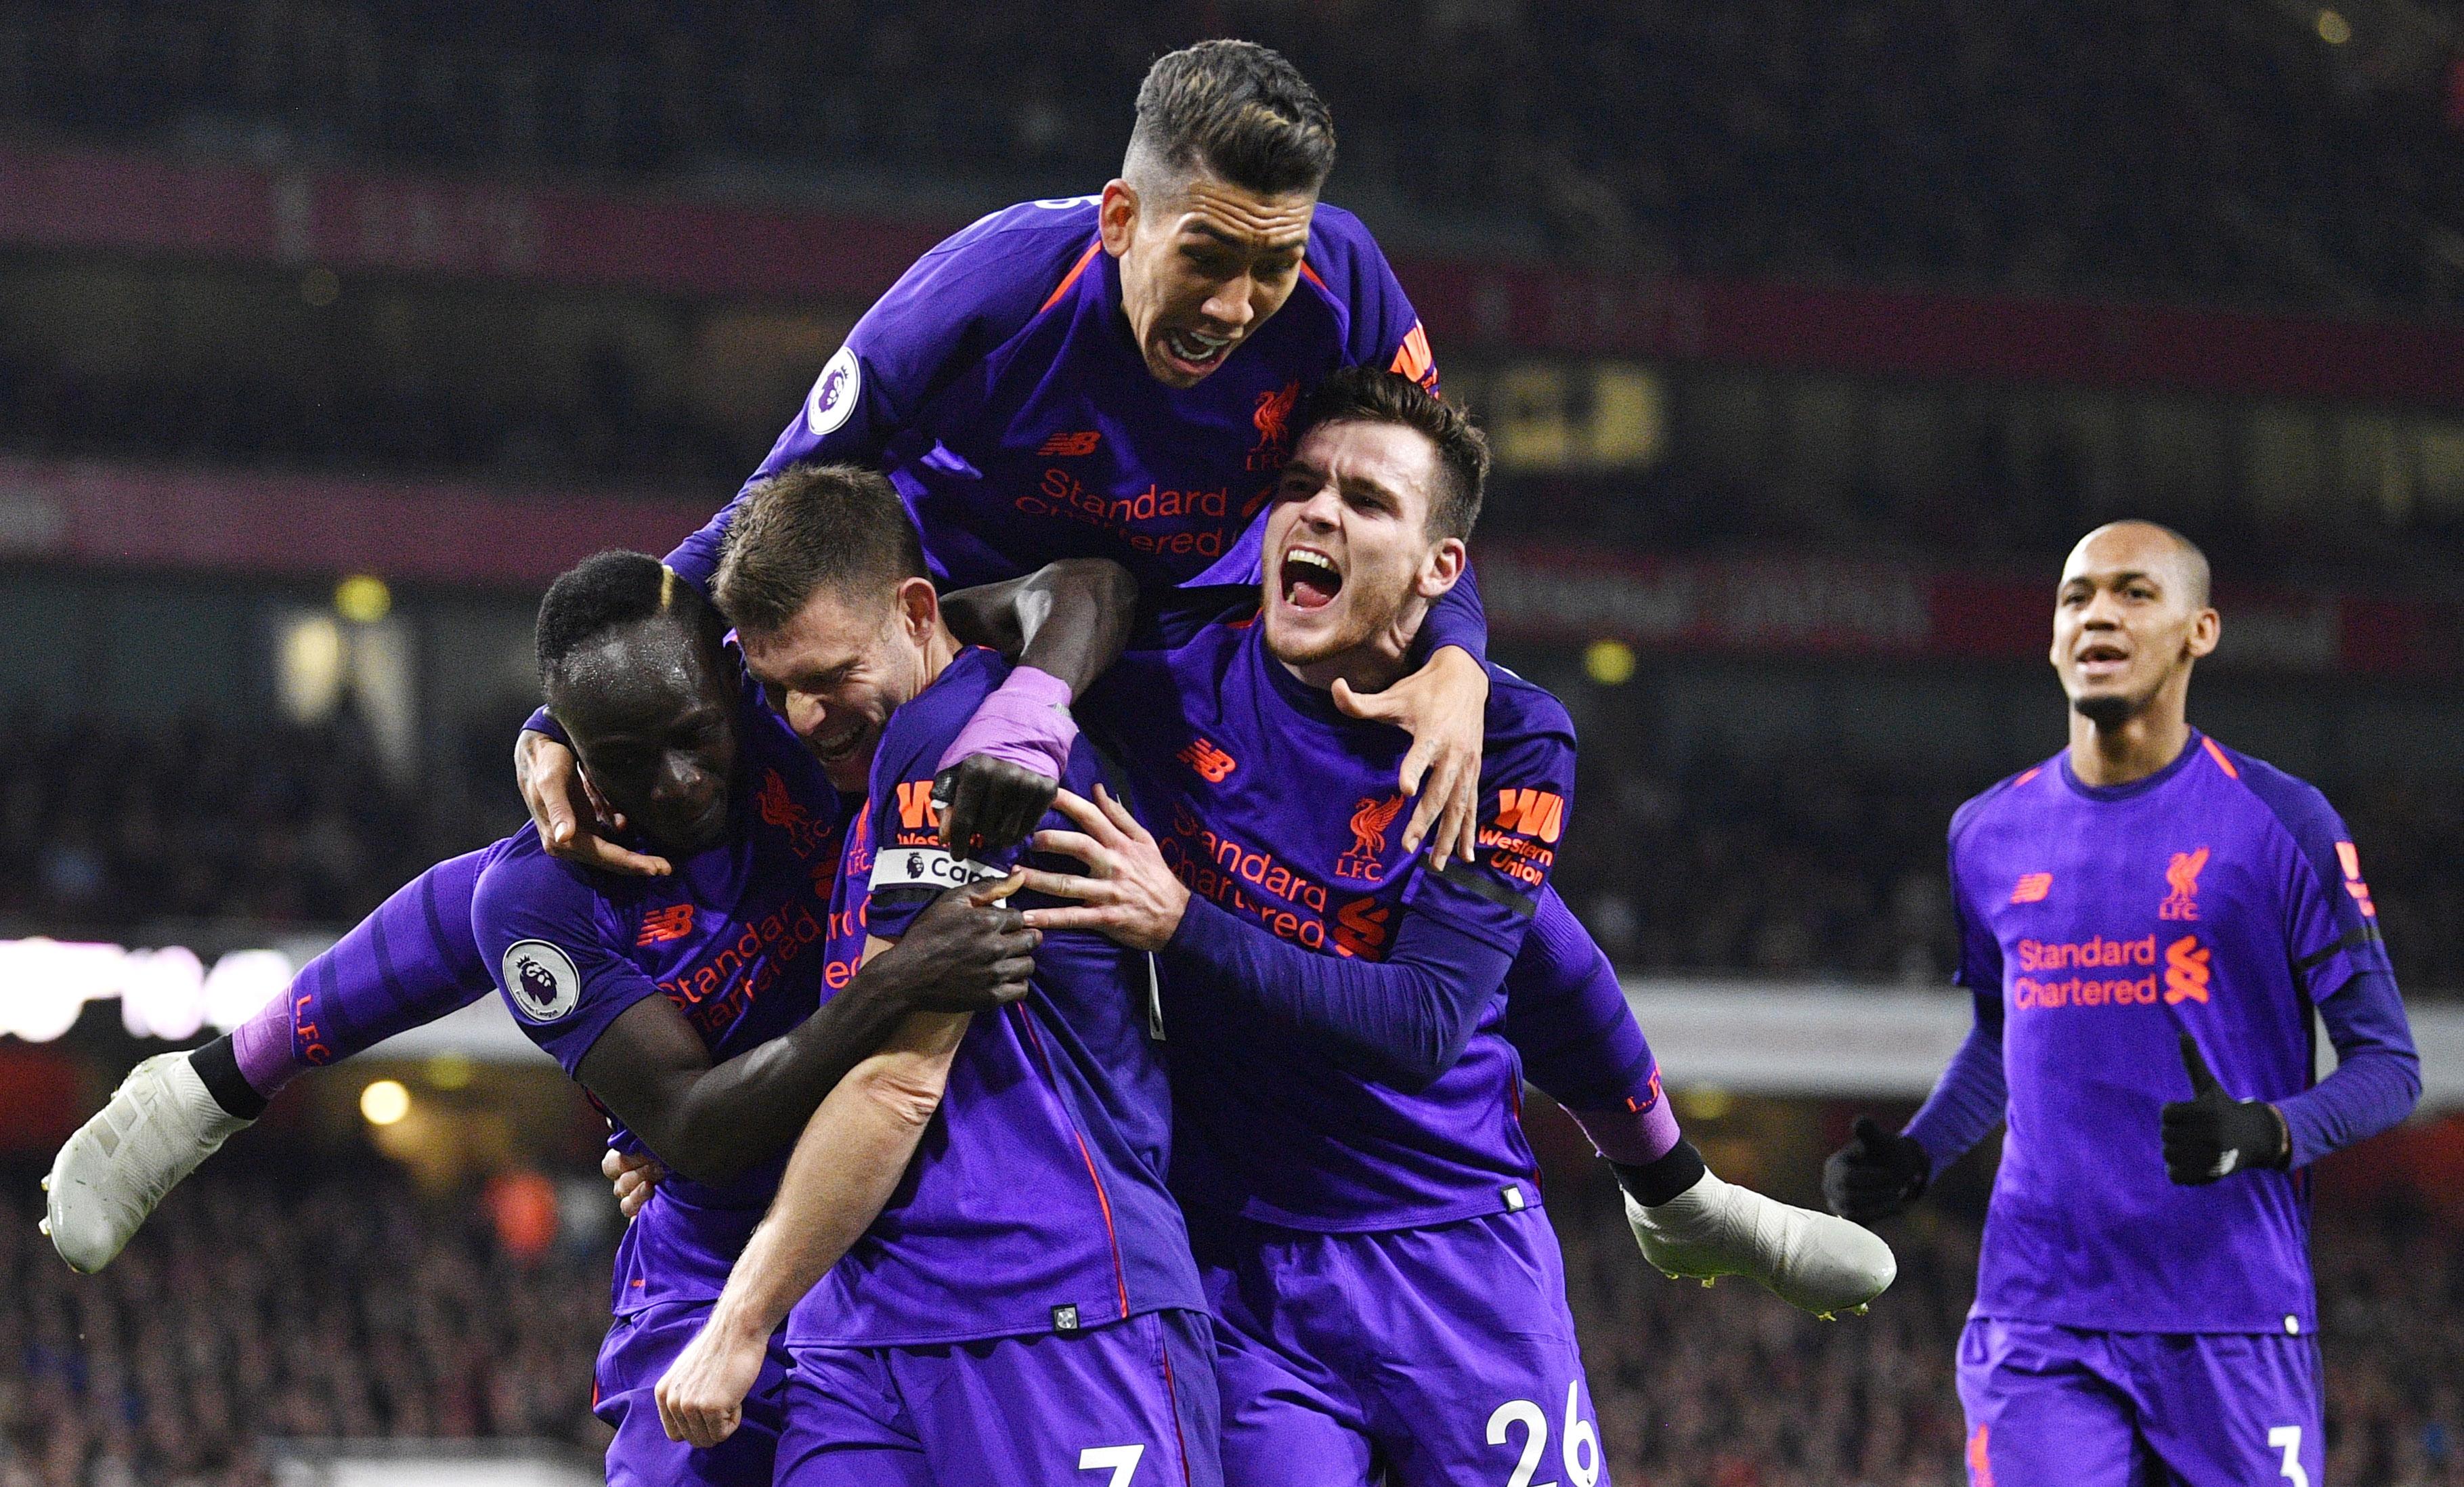 Arsenal v Liverpool live in the Premier League - Live - BBC